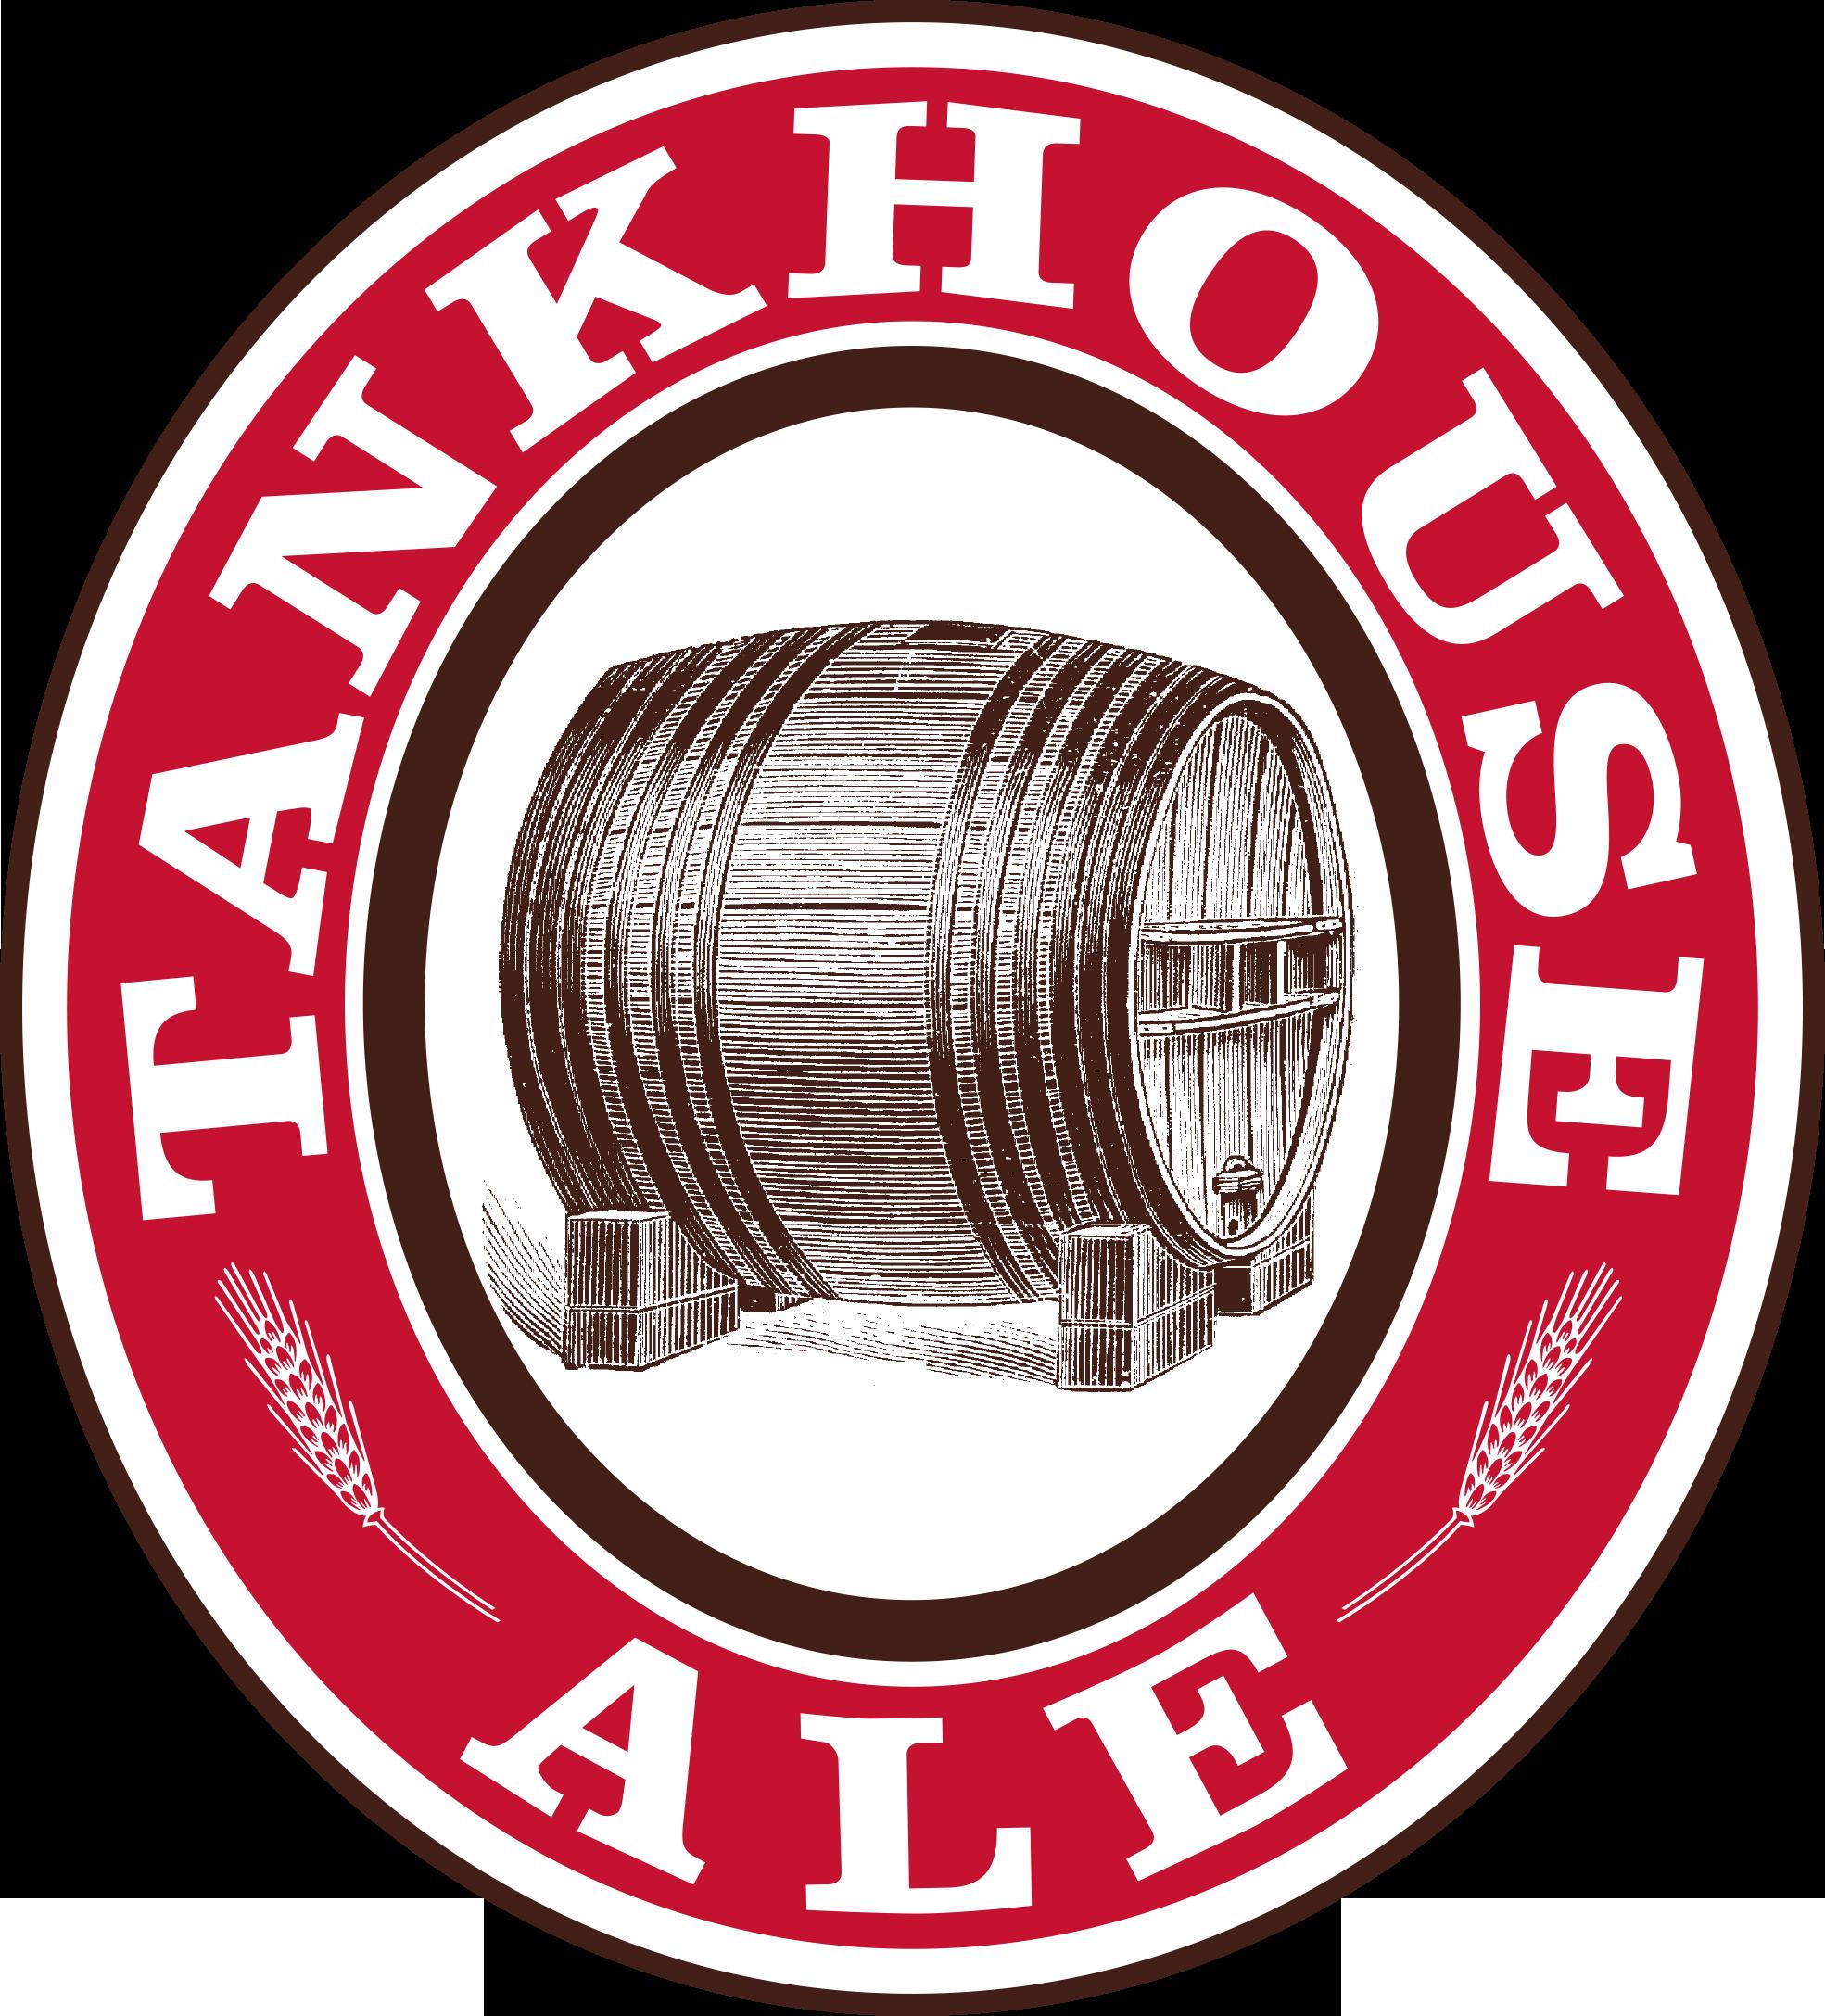 Mill St - Tankhouse Ale